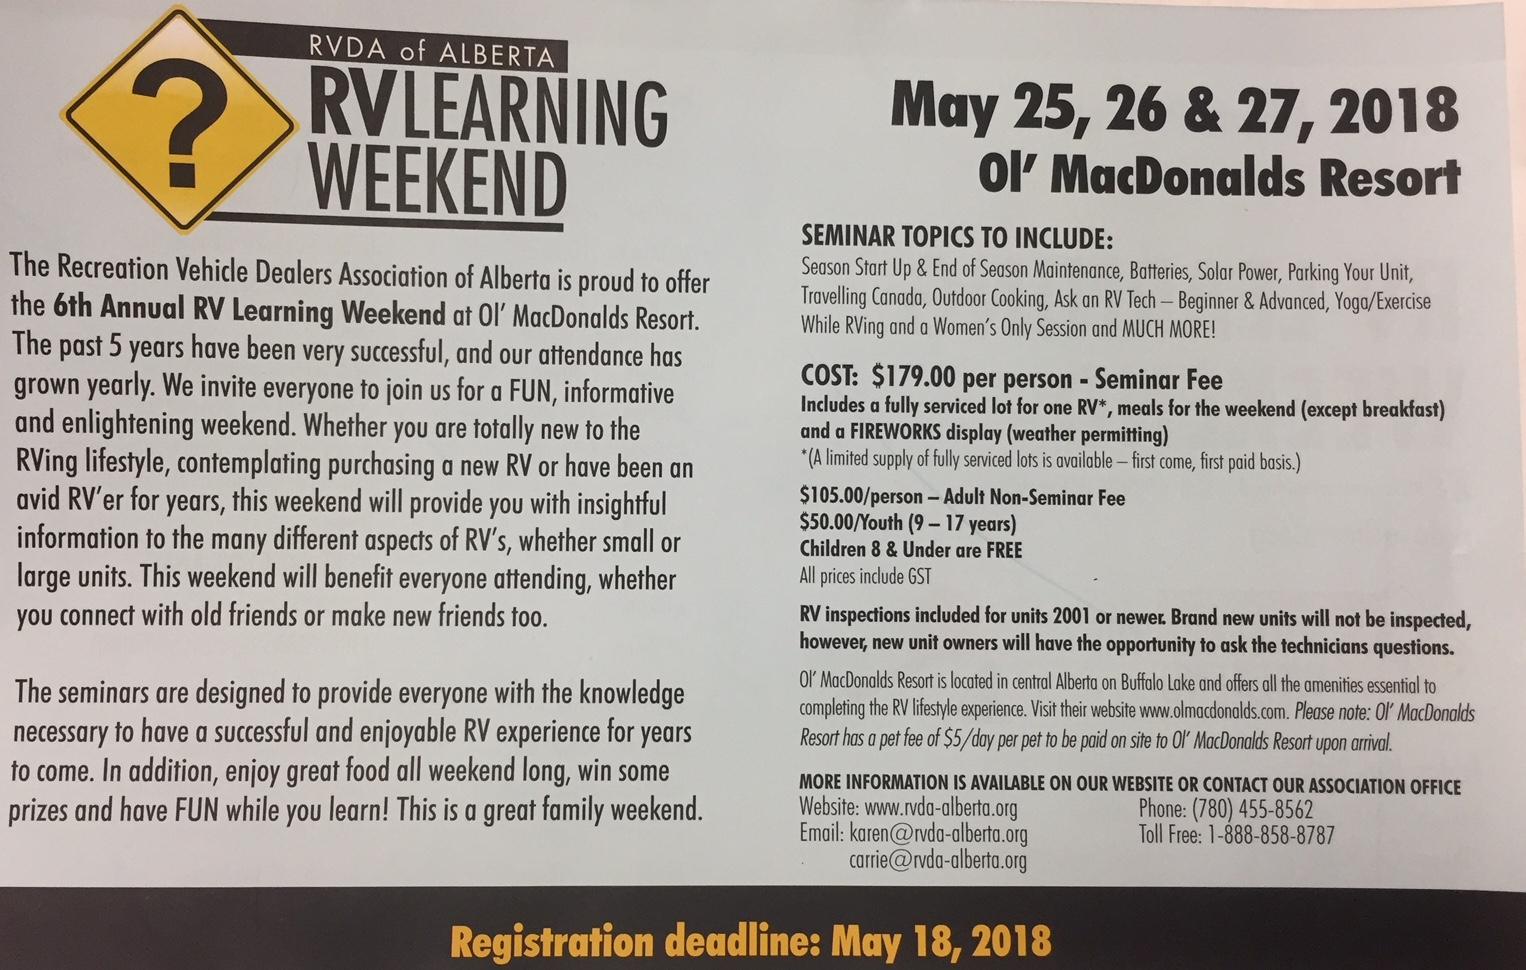 RVDA Learning Weekend Image